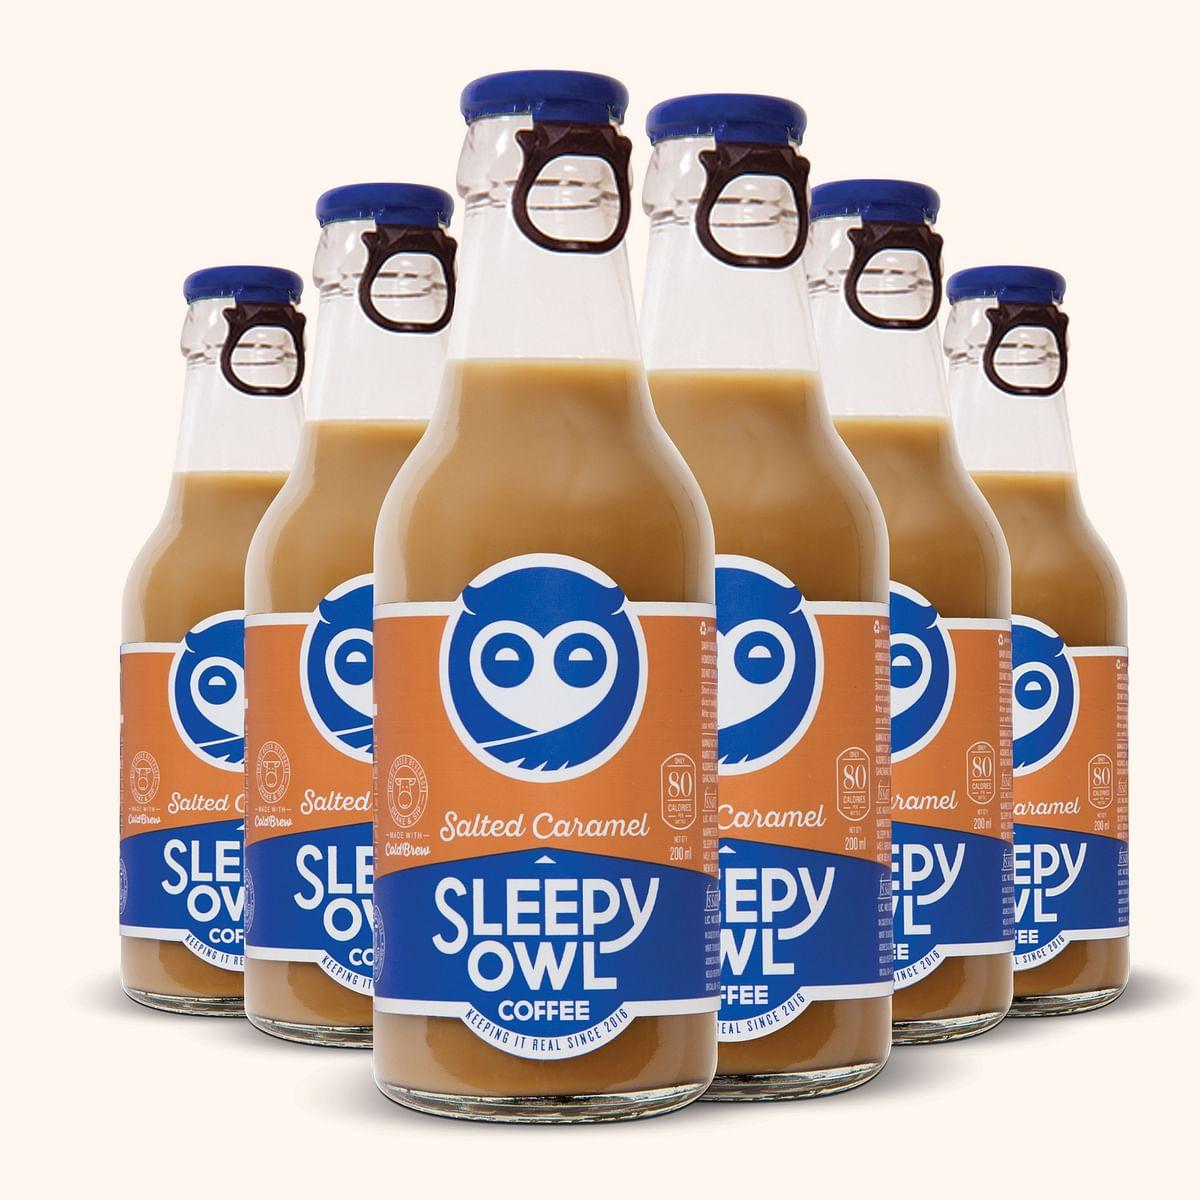 Sleepy Owl's Cold Coffee